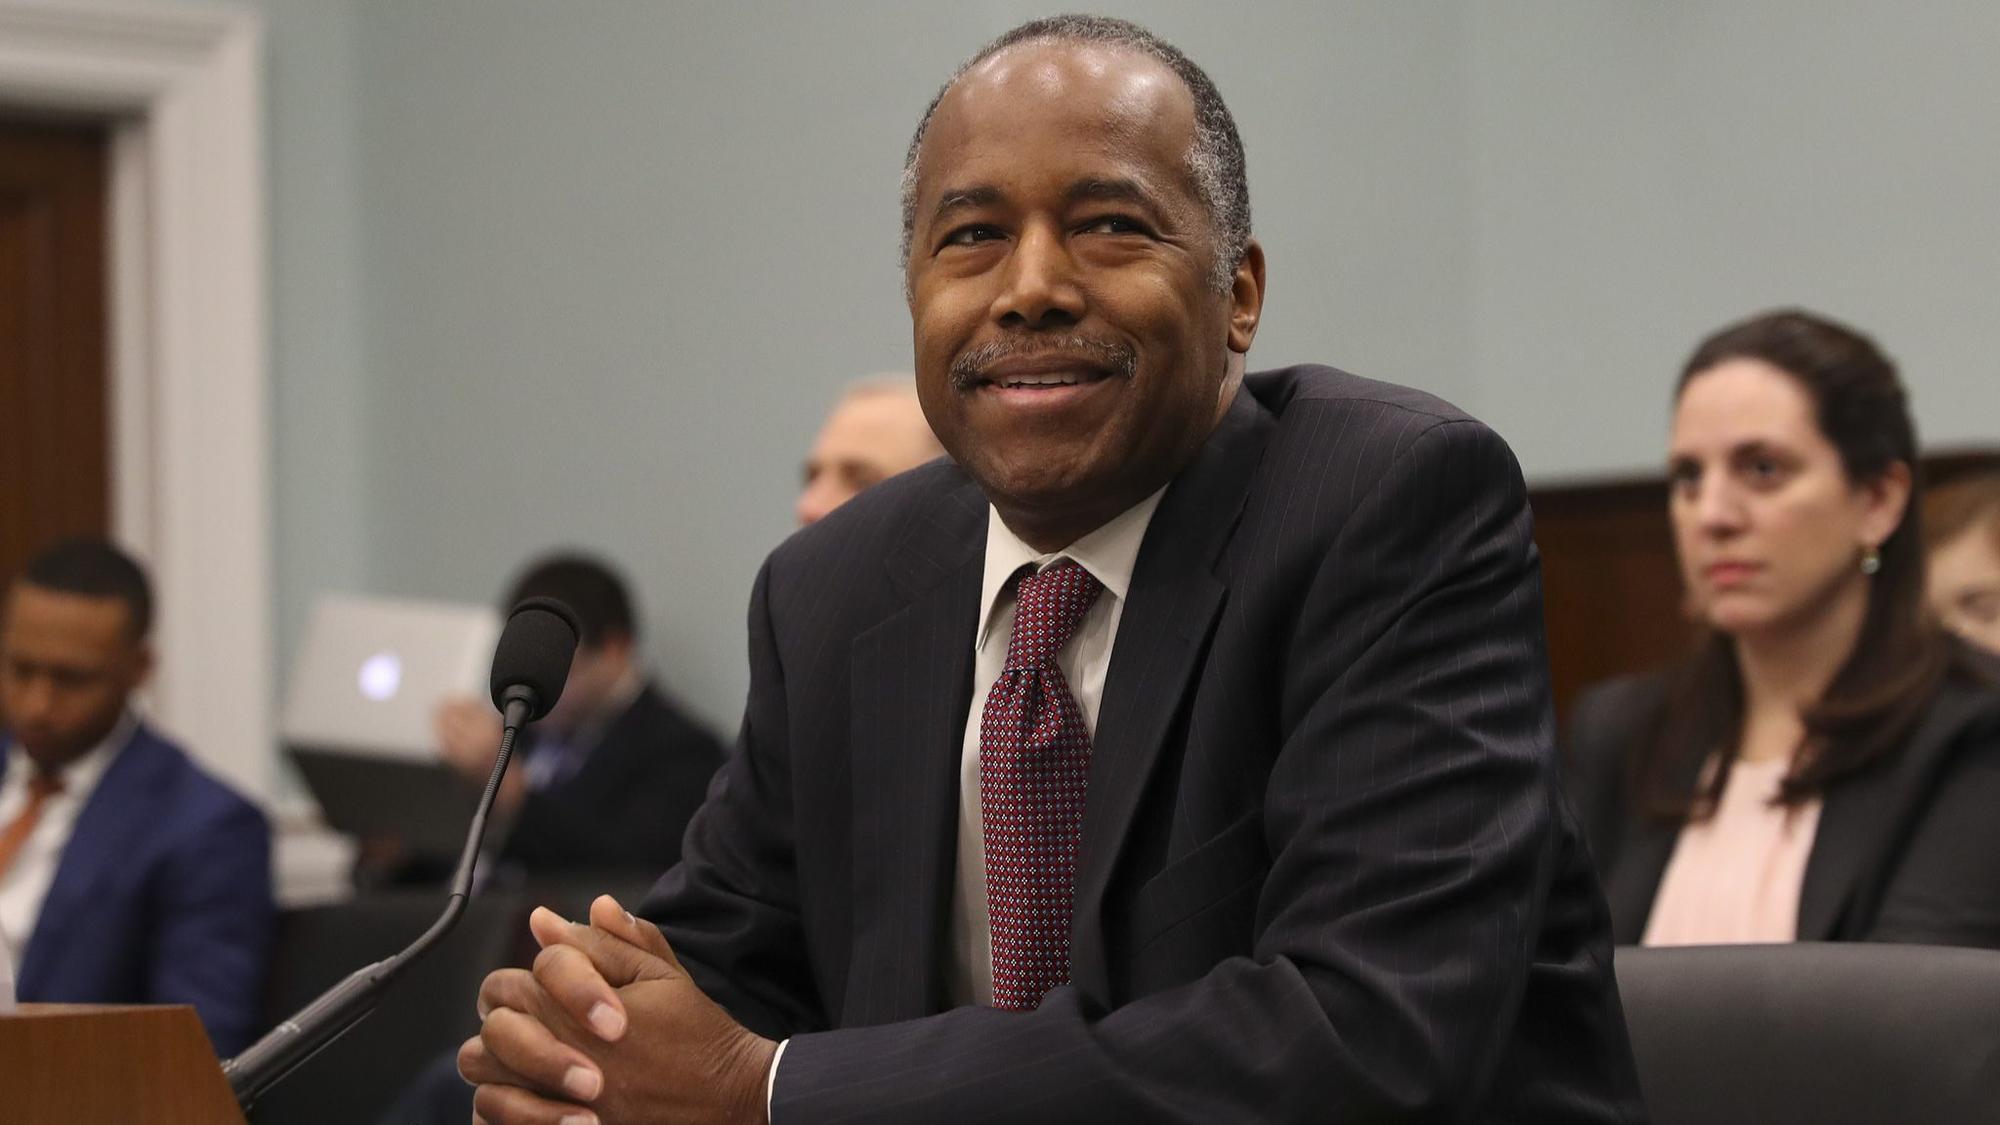 Hud Secretary Ben Carson Tells Lawmakers He Left Decision On